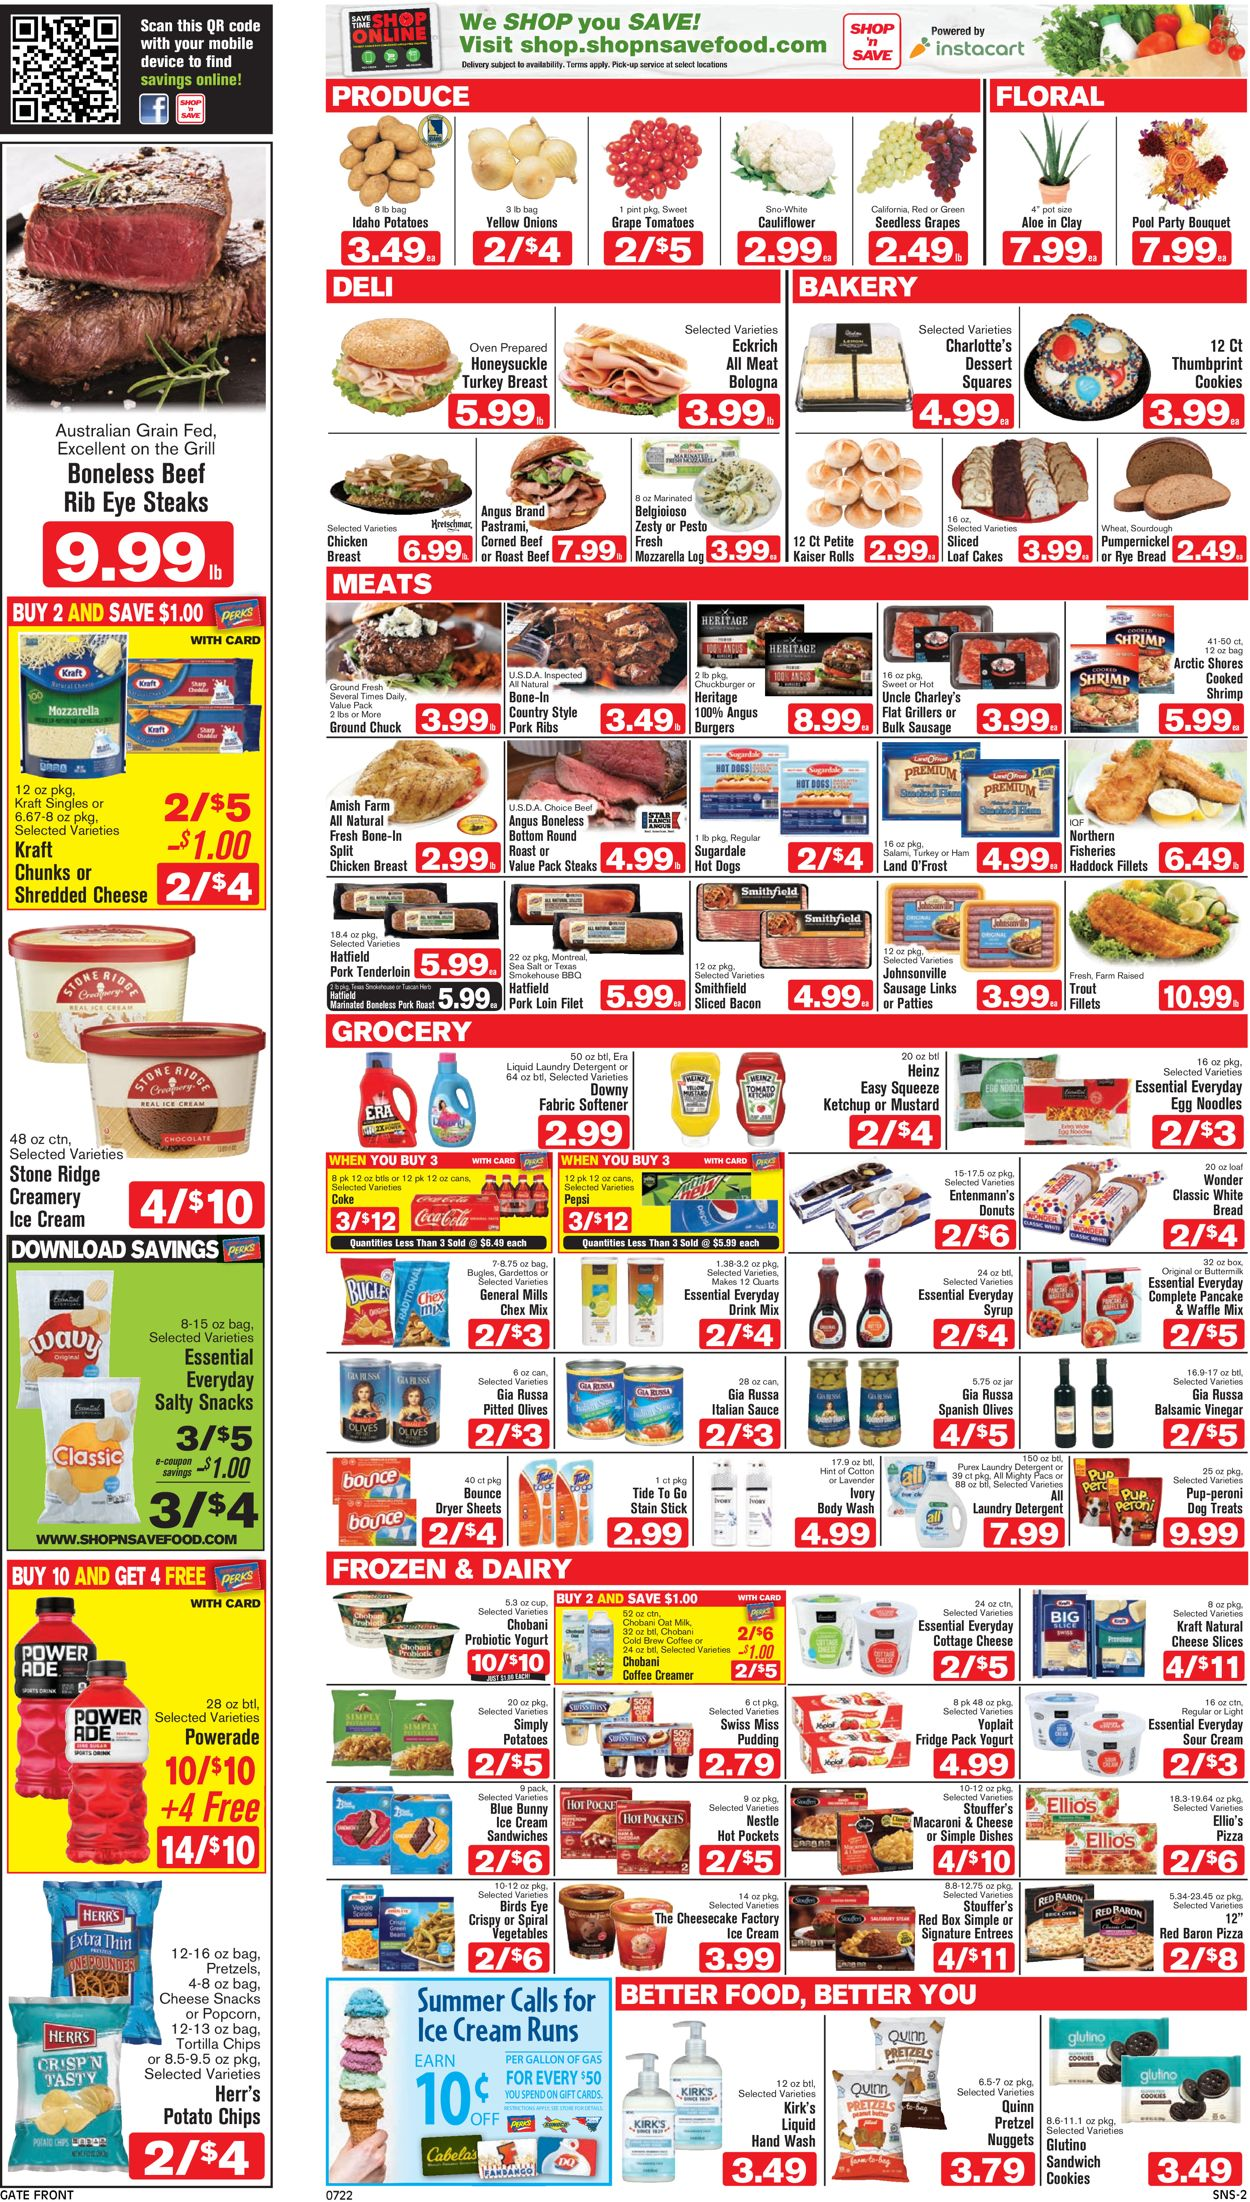 Shop 'n Save Weekly Ad Circular - valid 07/22-07/28/2021 (Page 2)